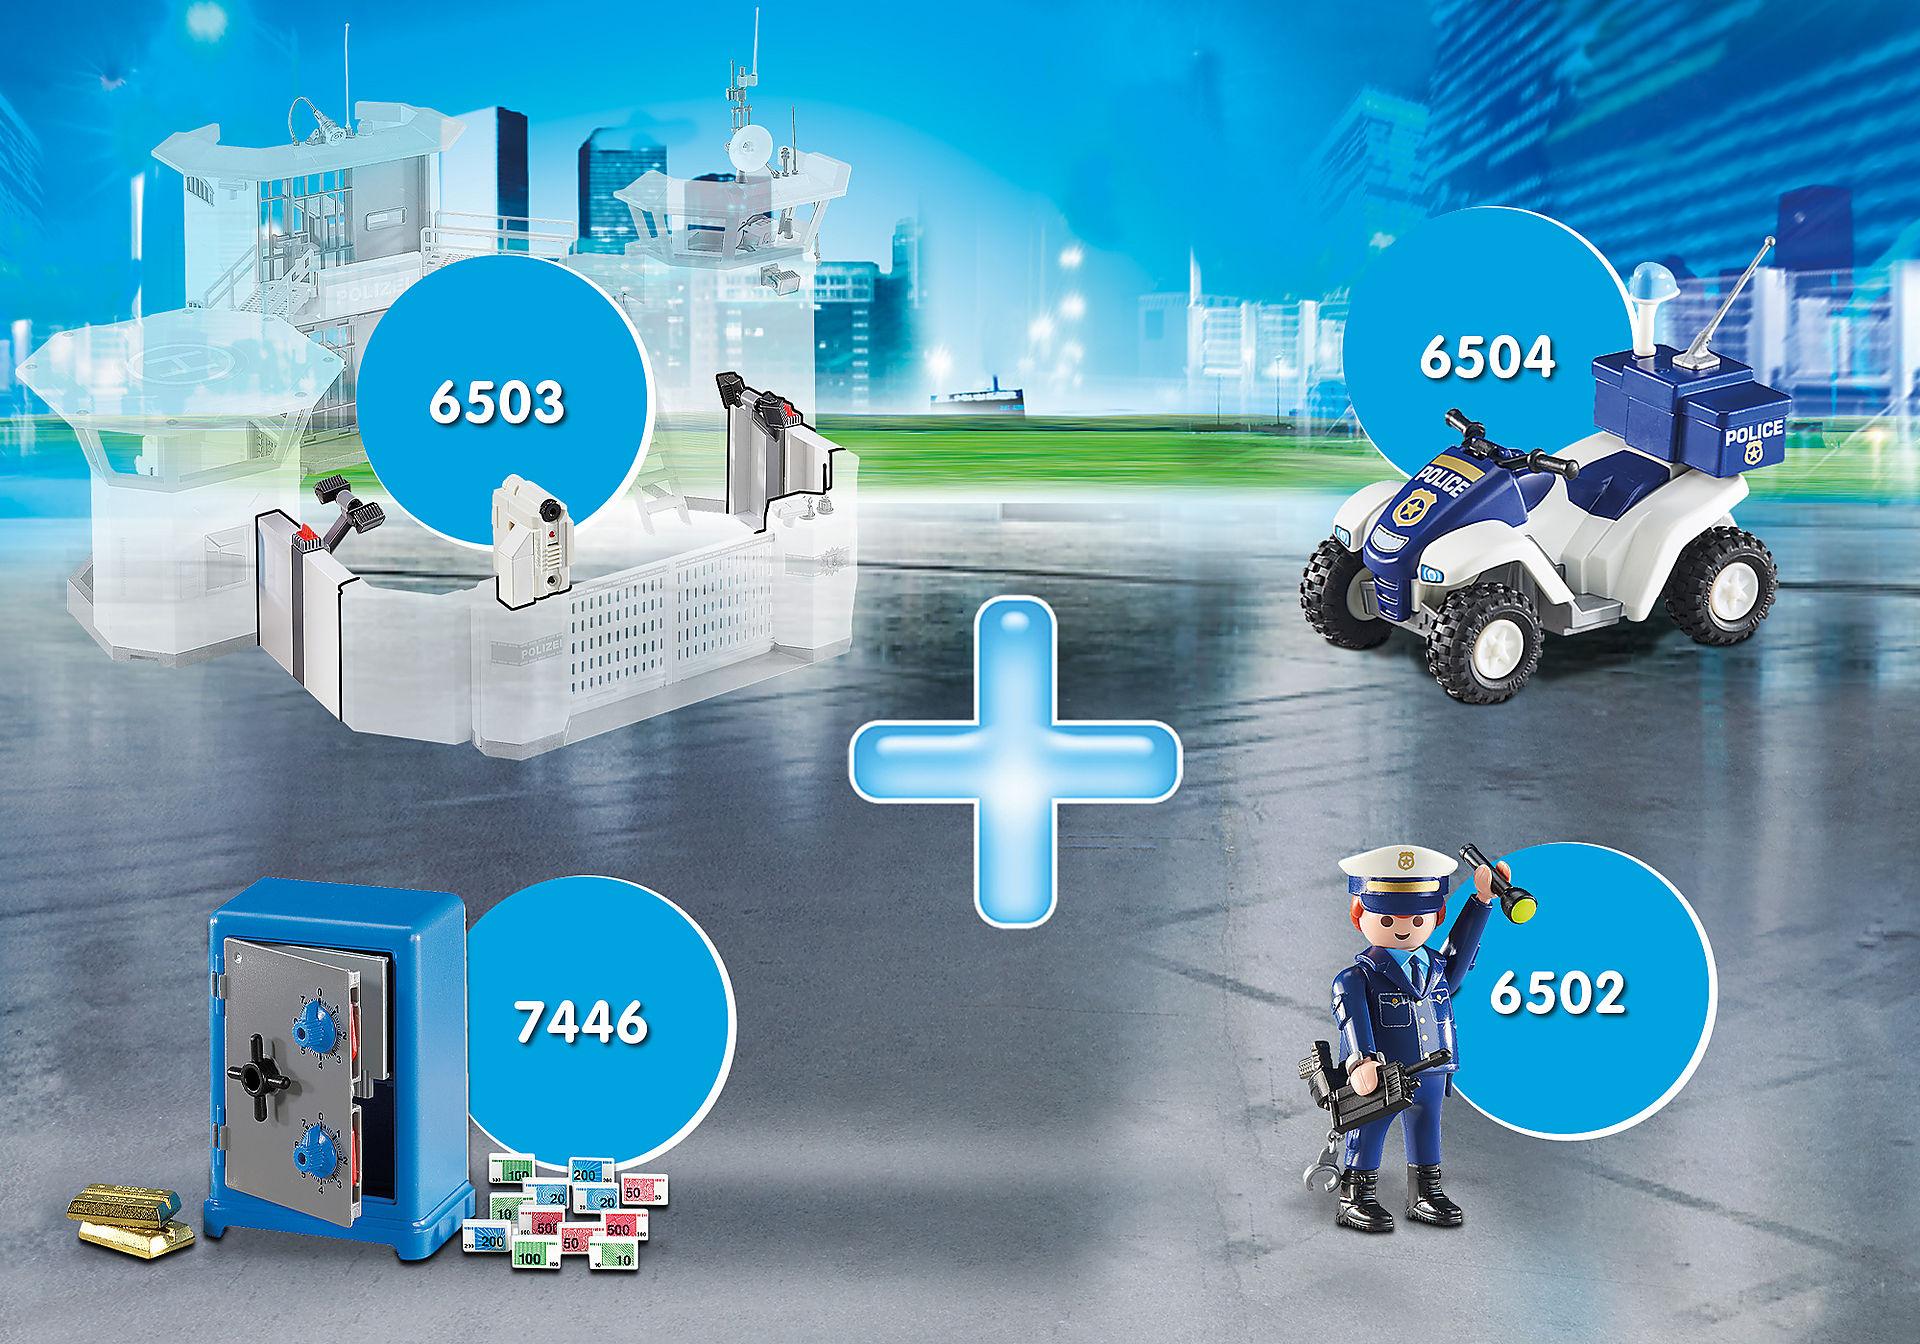 PM2012I Súper Promo Pack Complementos Policía zoom image1